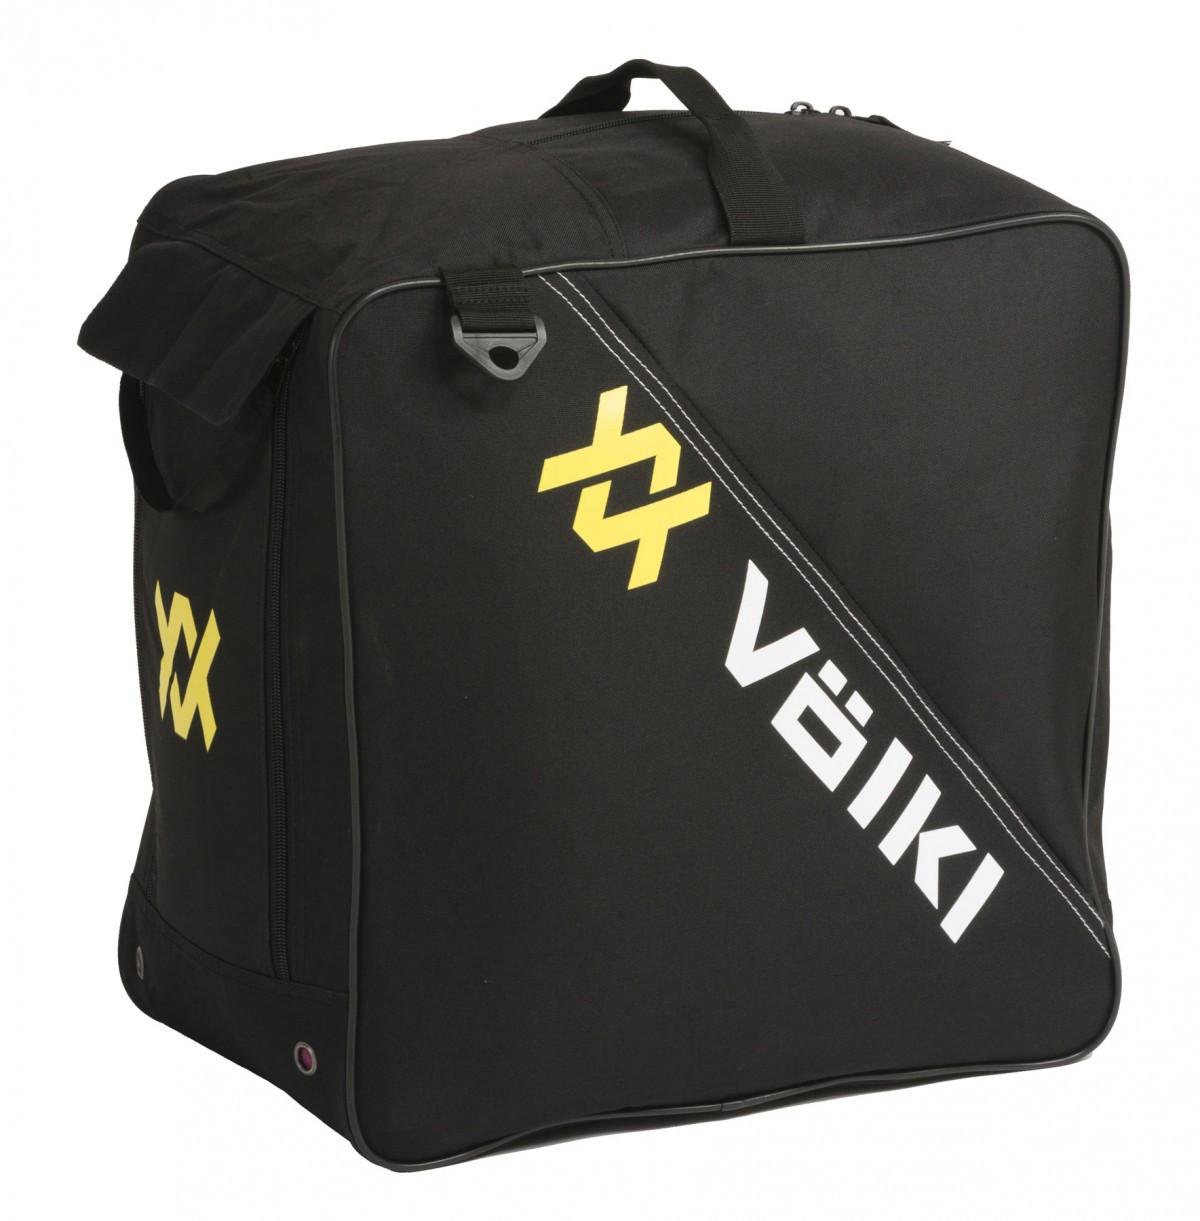 Völkl Classic Boot & Helmet Bag